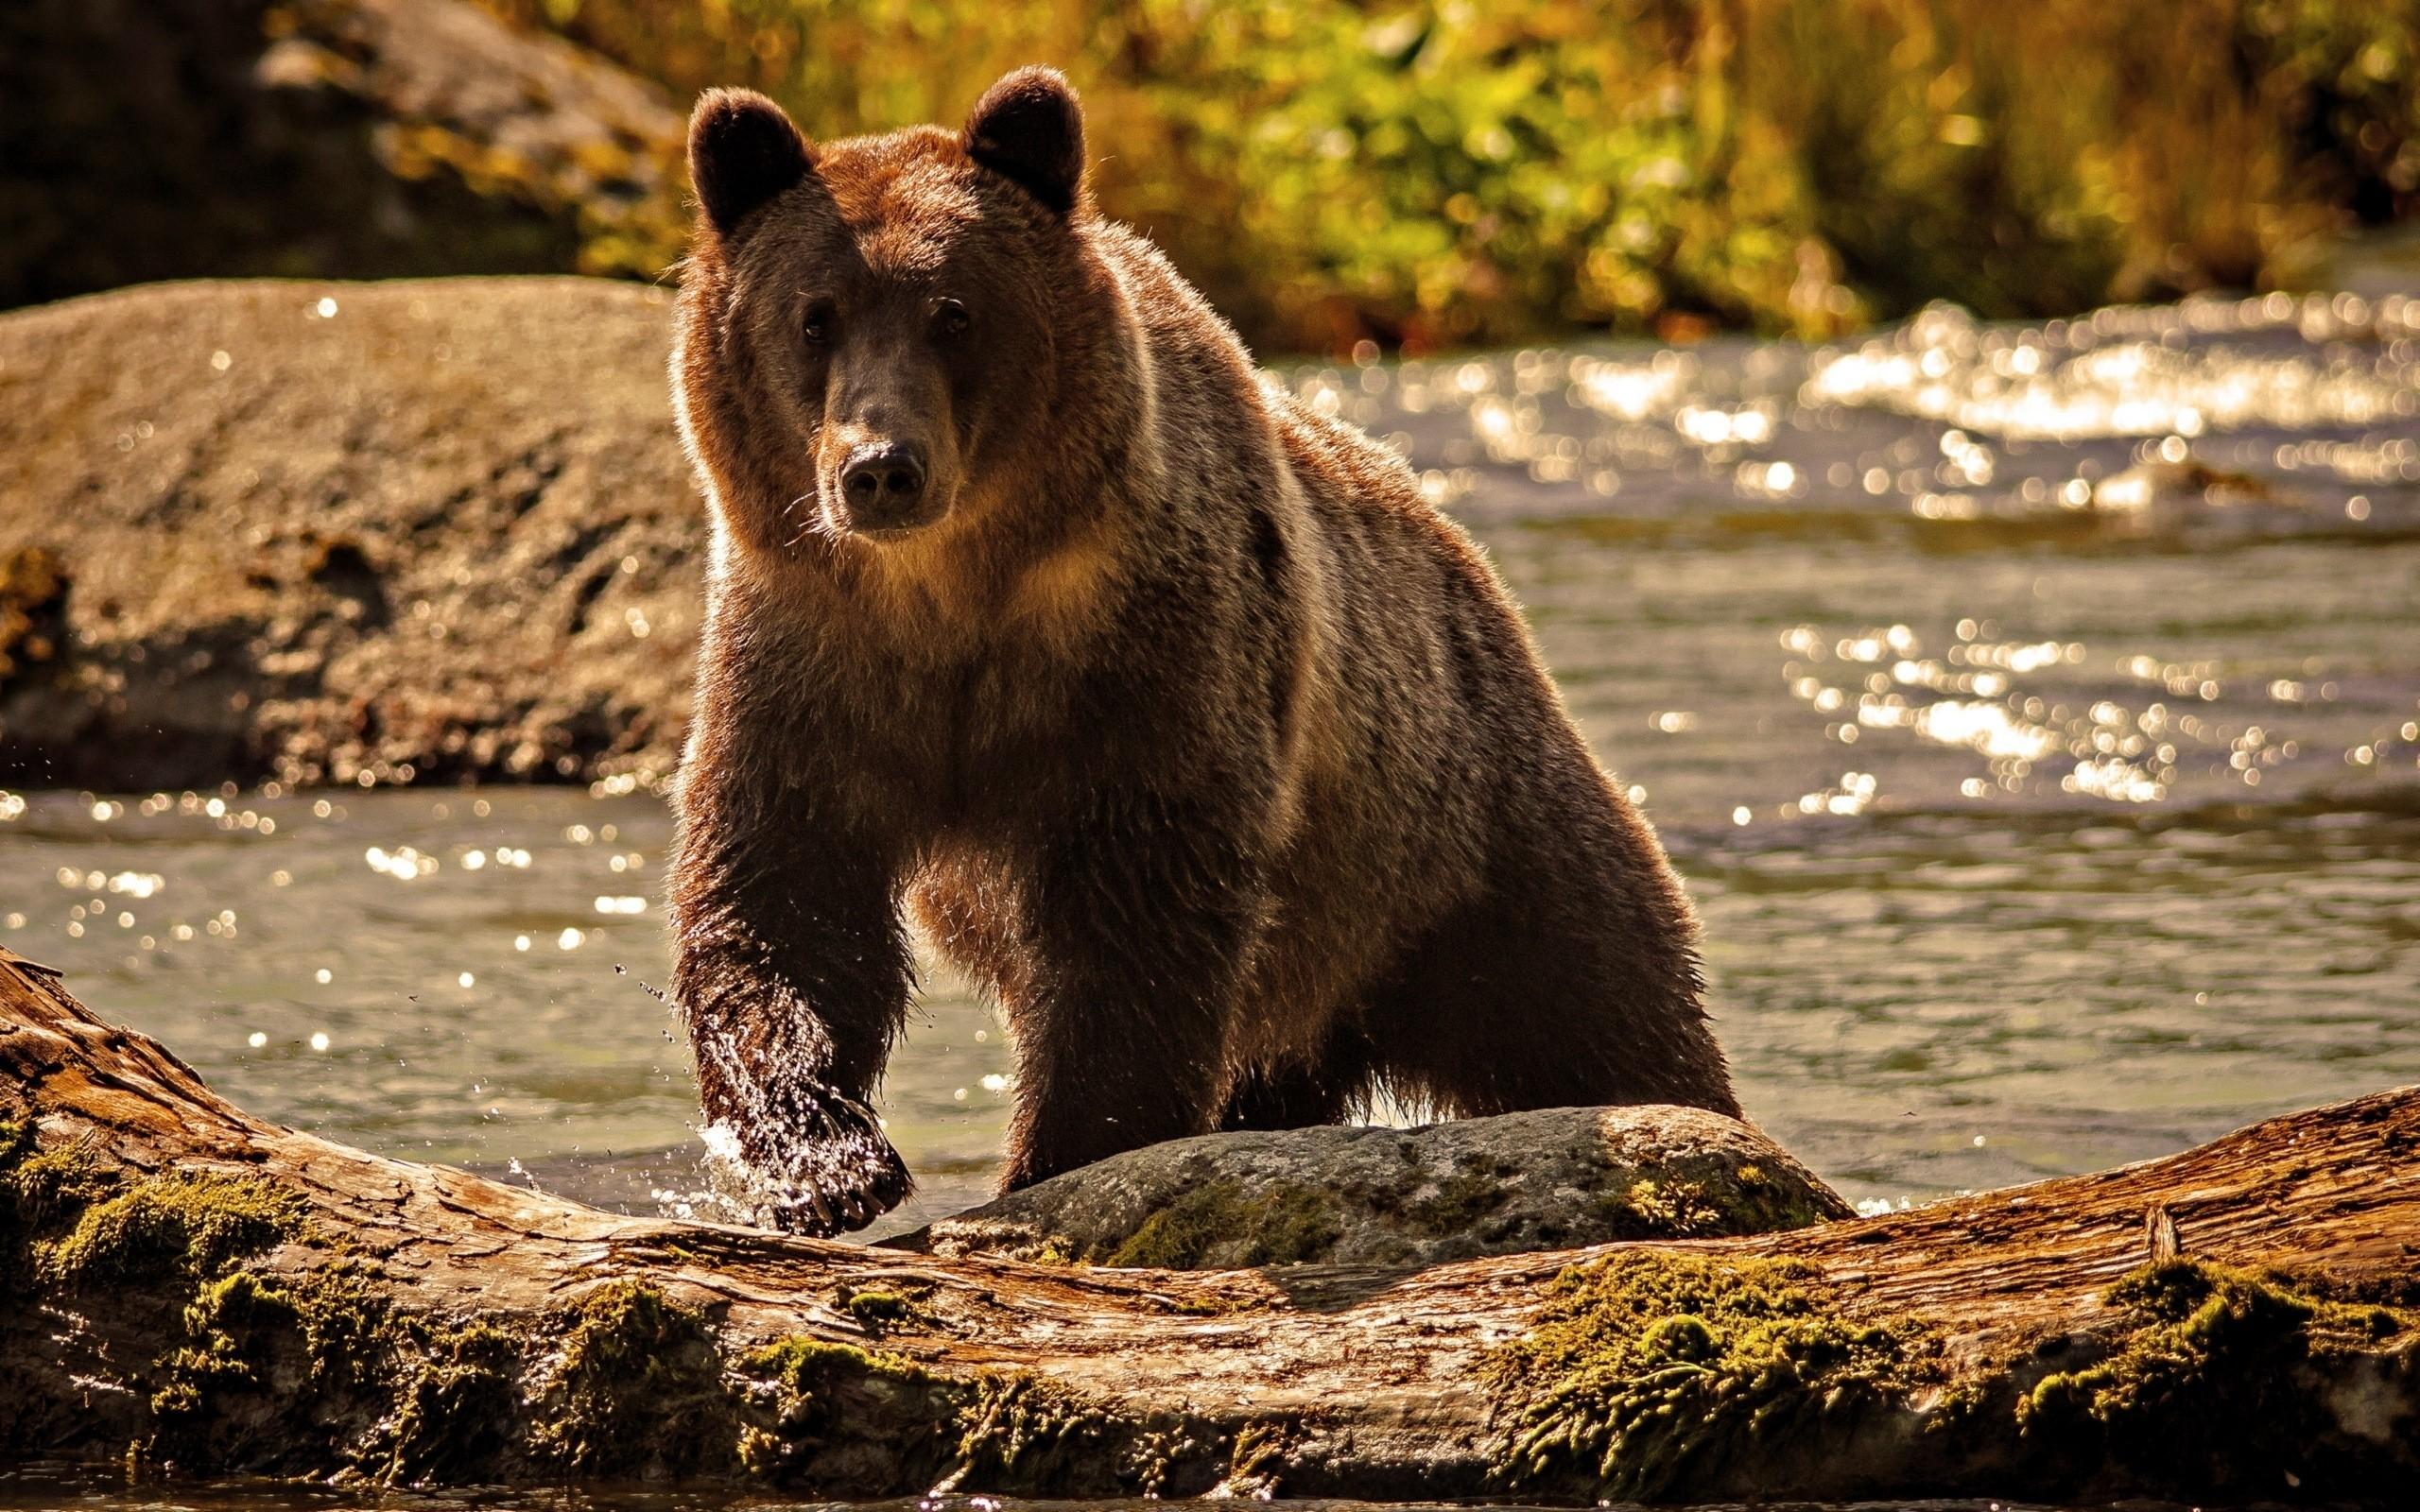 Bear Wallpaper Download Free Stunning High Resolution